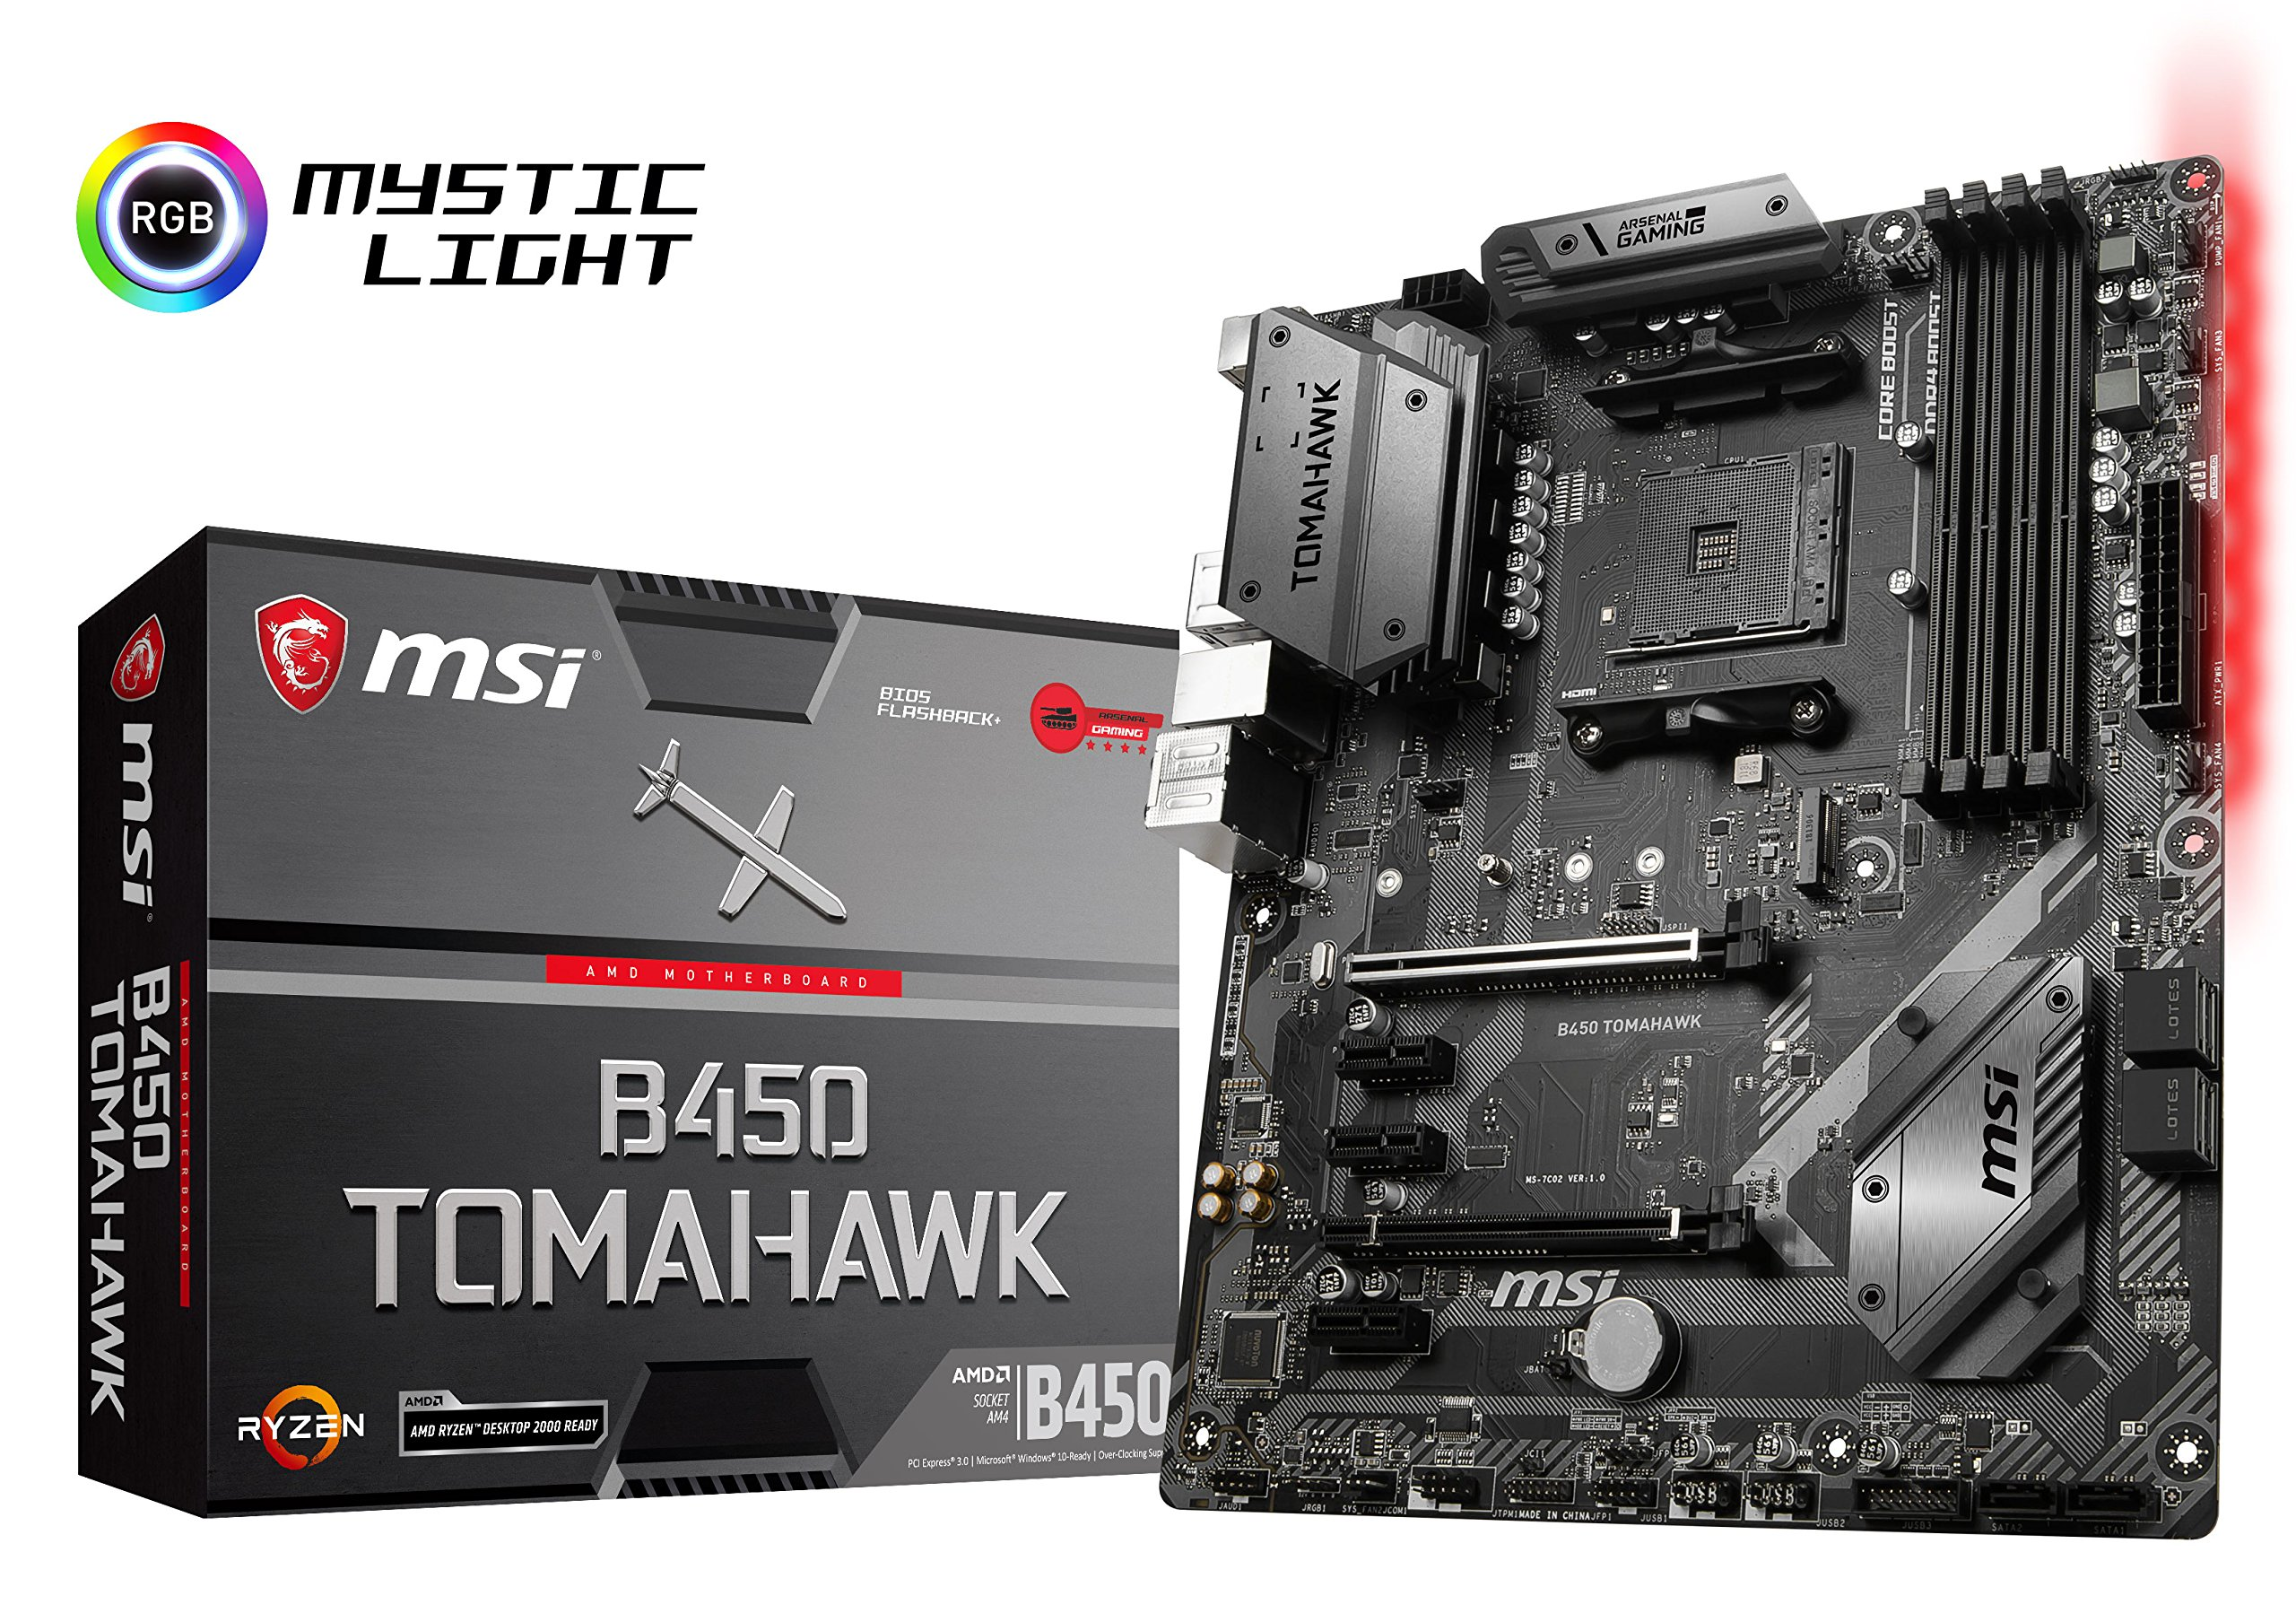 MSI Arsenal Gaming AMD Ryzen 1st and 2nd Gen AM4 M.2 USB 3 DDR4 DVI HDMI Crossfire ATX Motherboard (B450 Tomahawk) by MSI